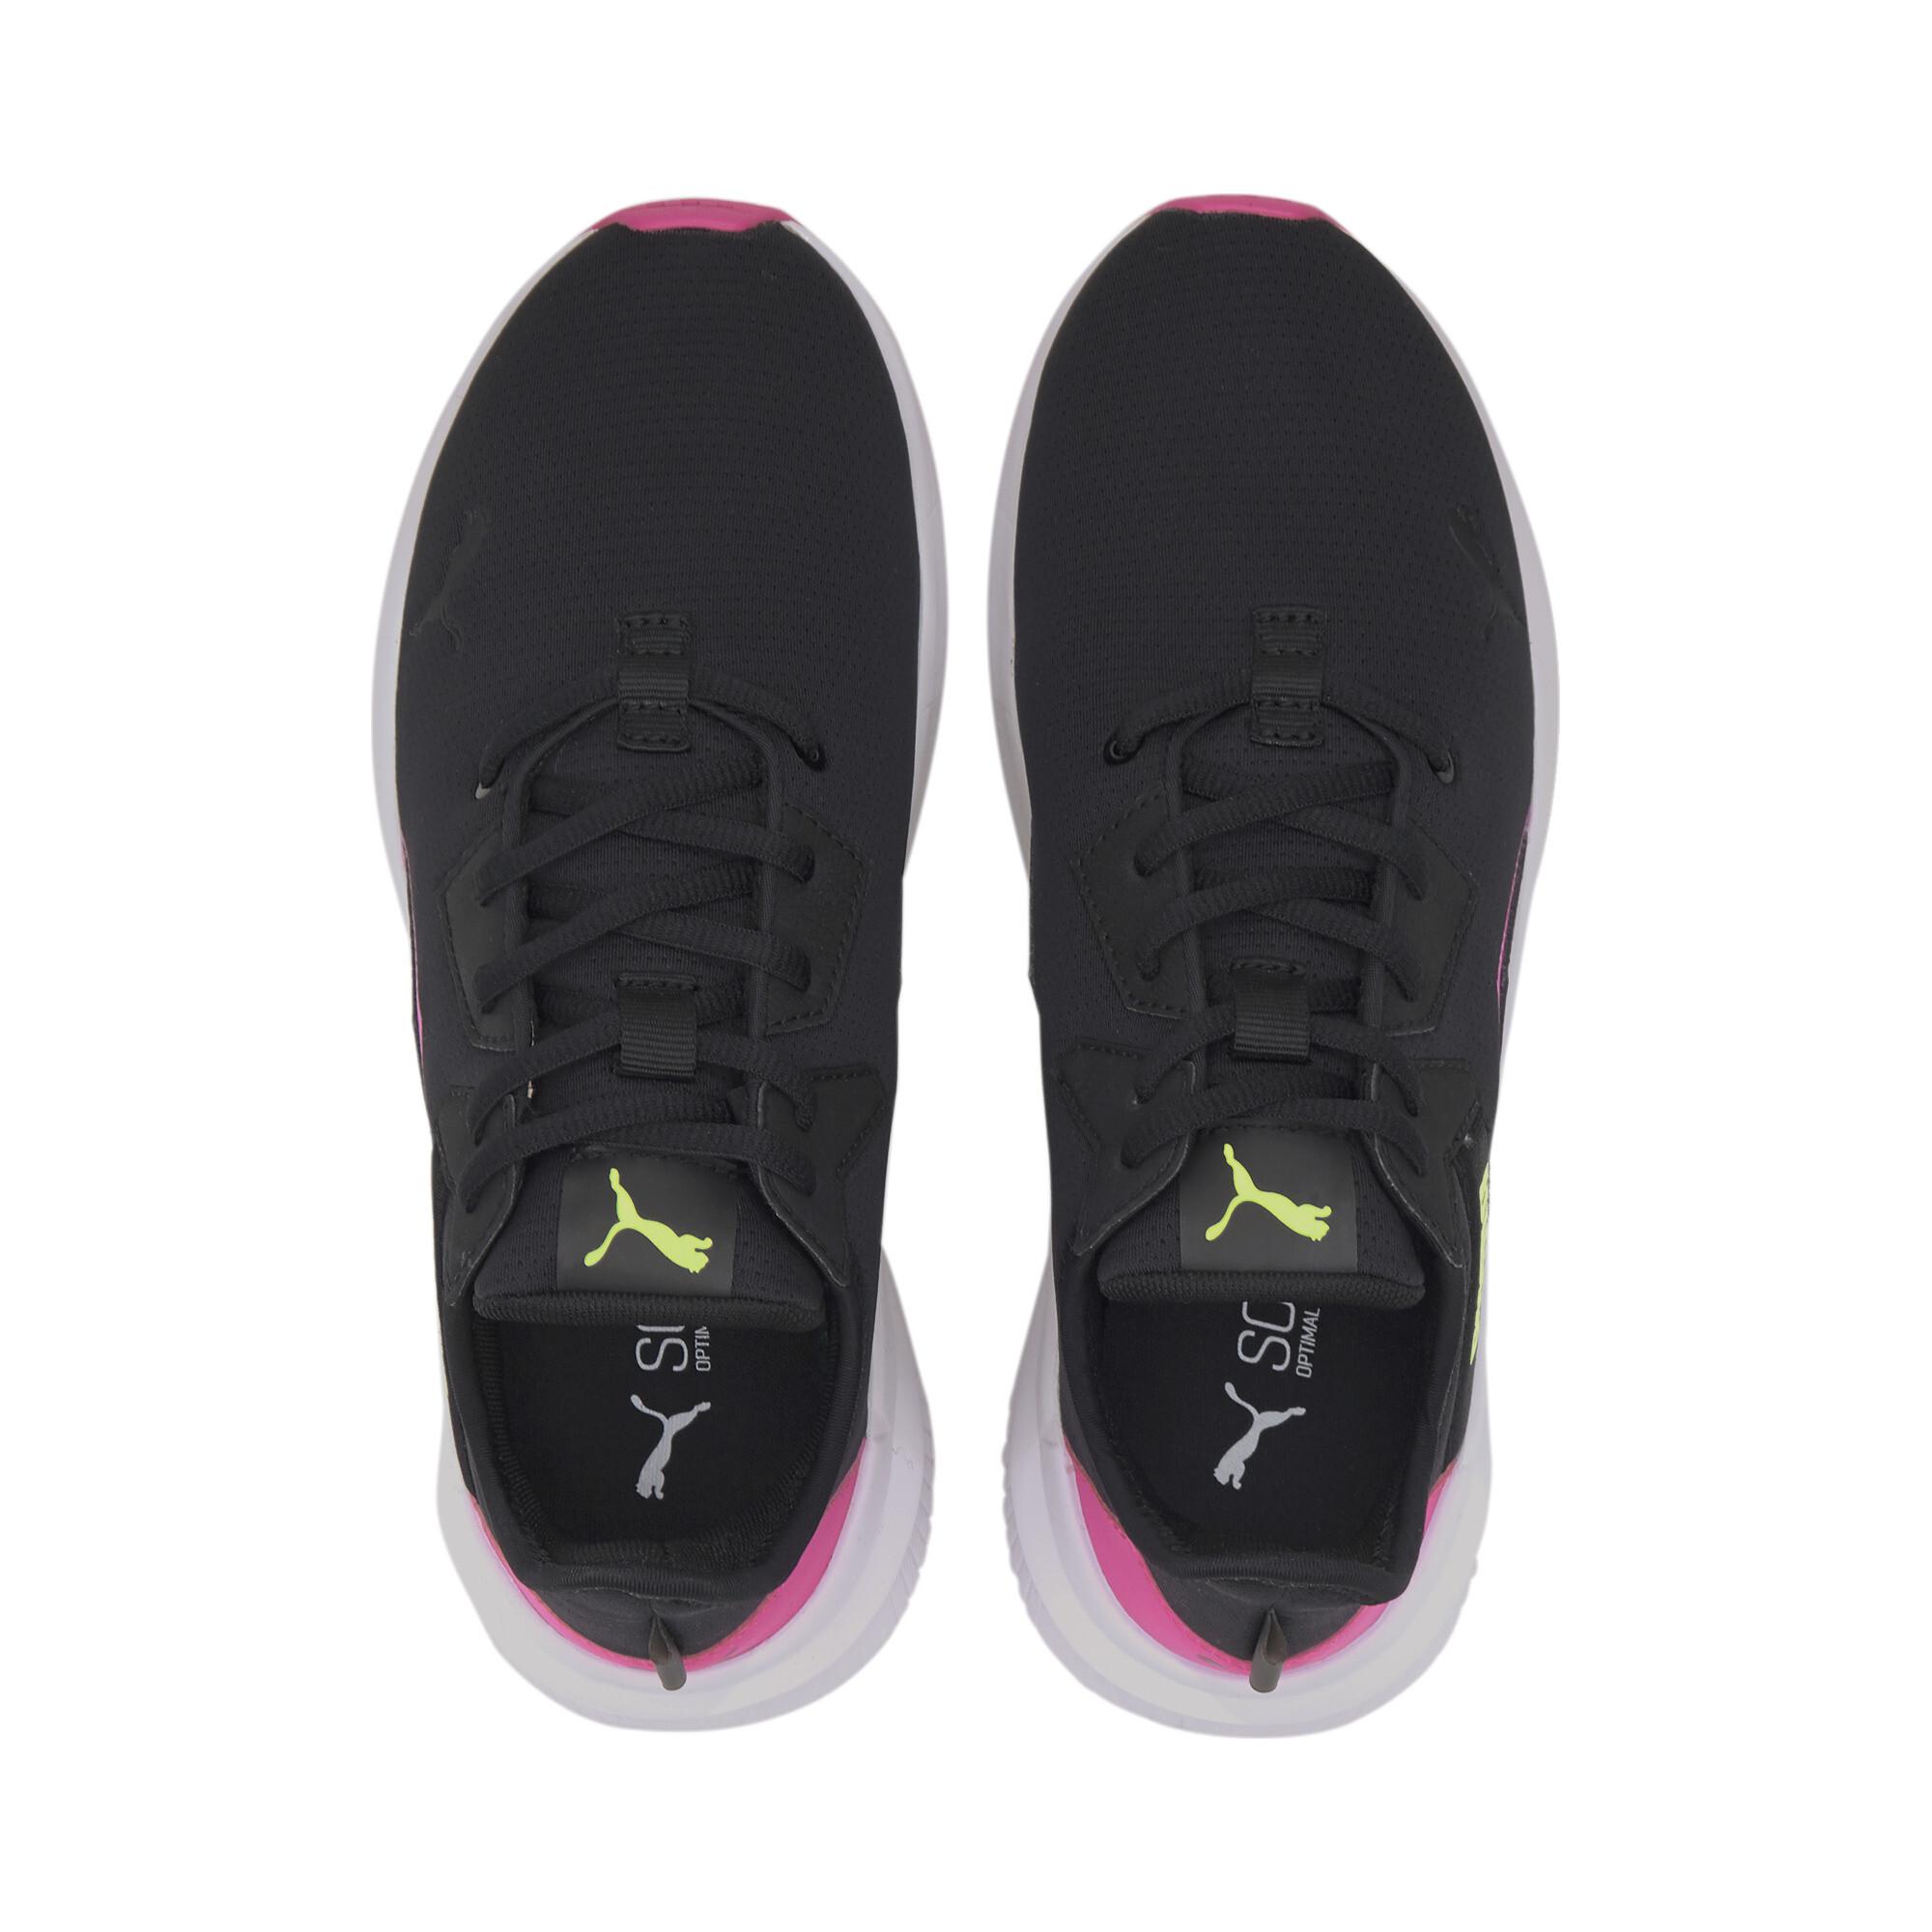 thumbnail 8 - PUMA-Women-039-s-Platinum-Training-Shoes